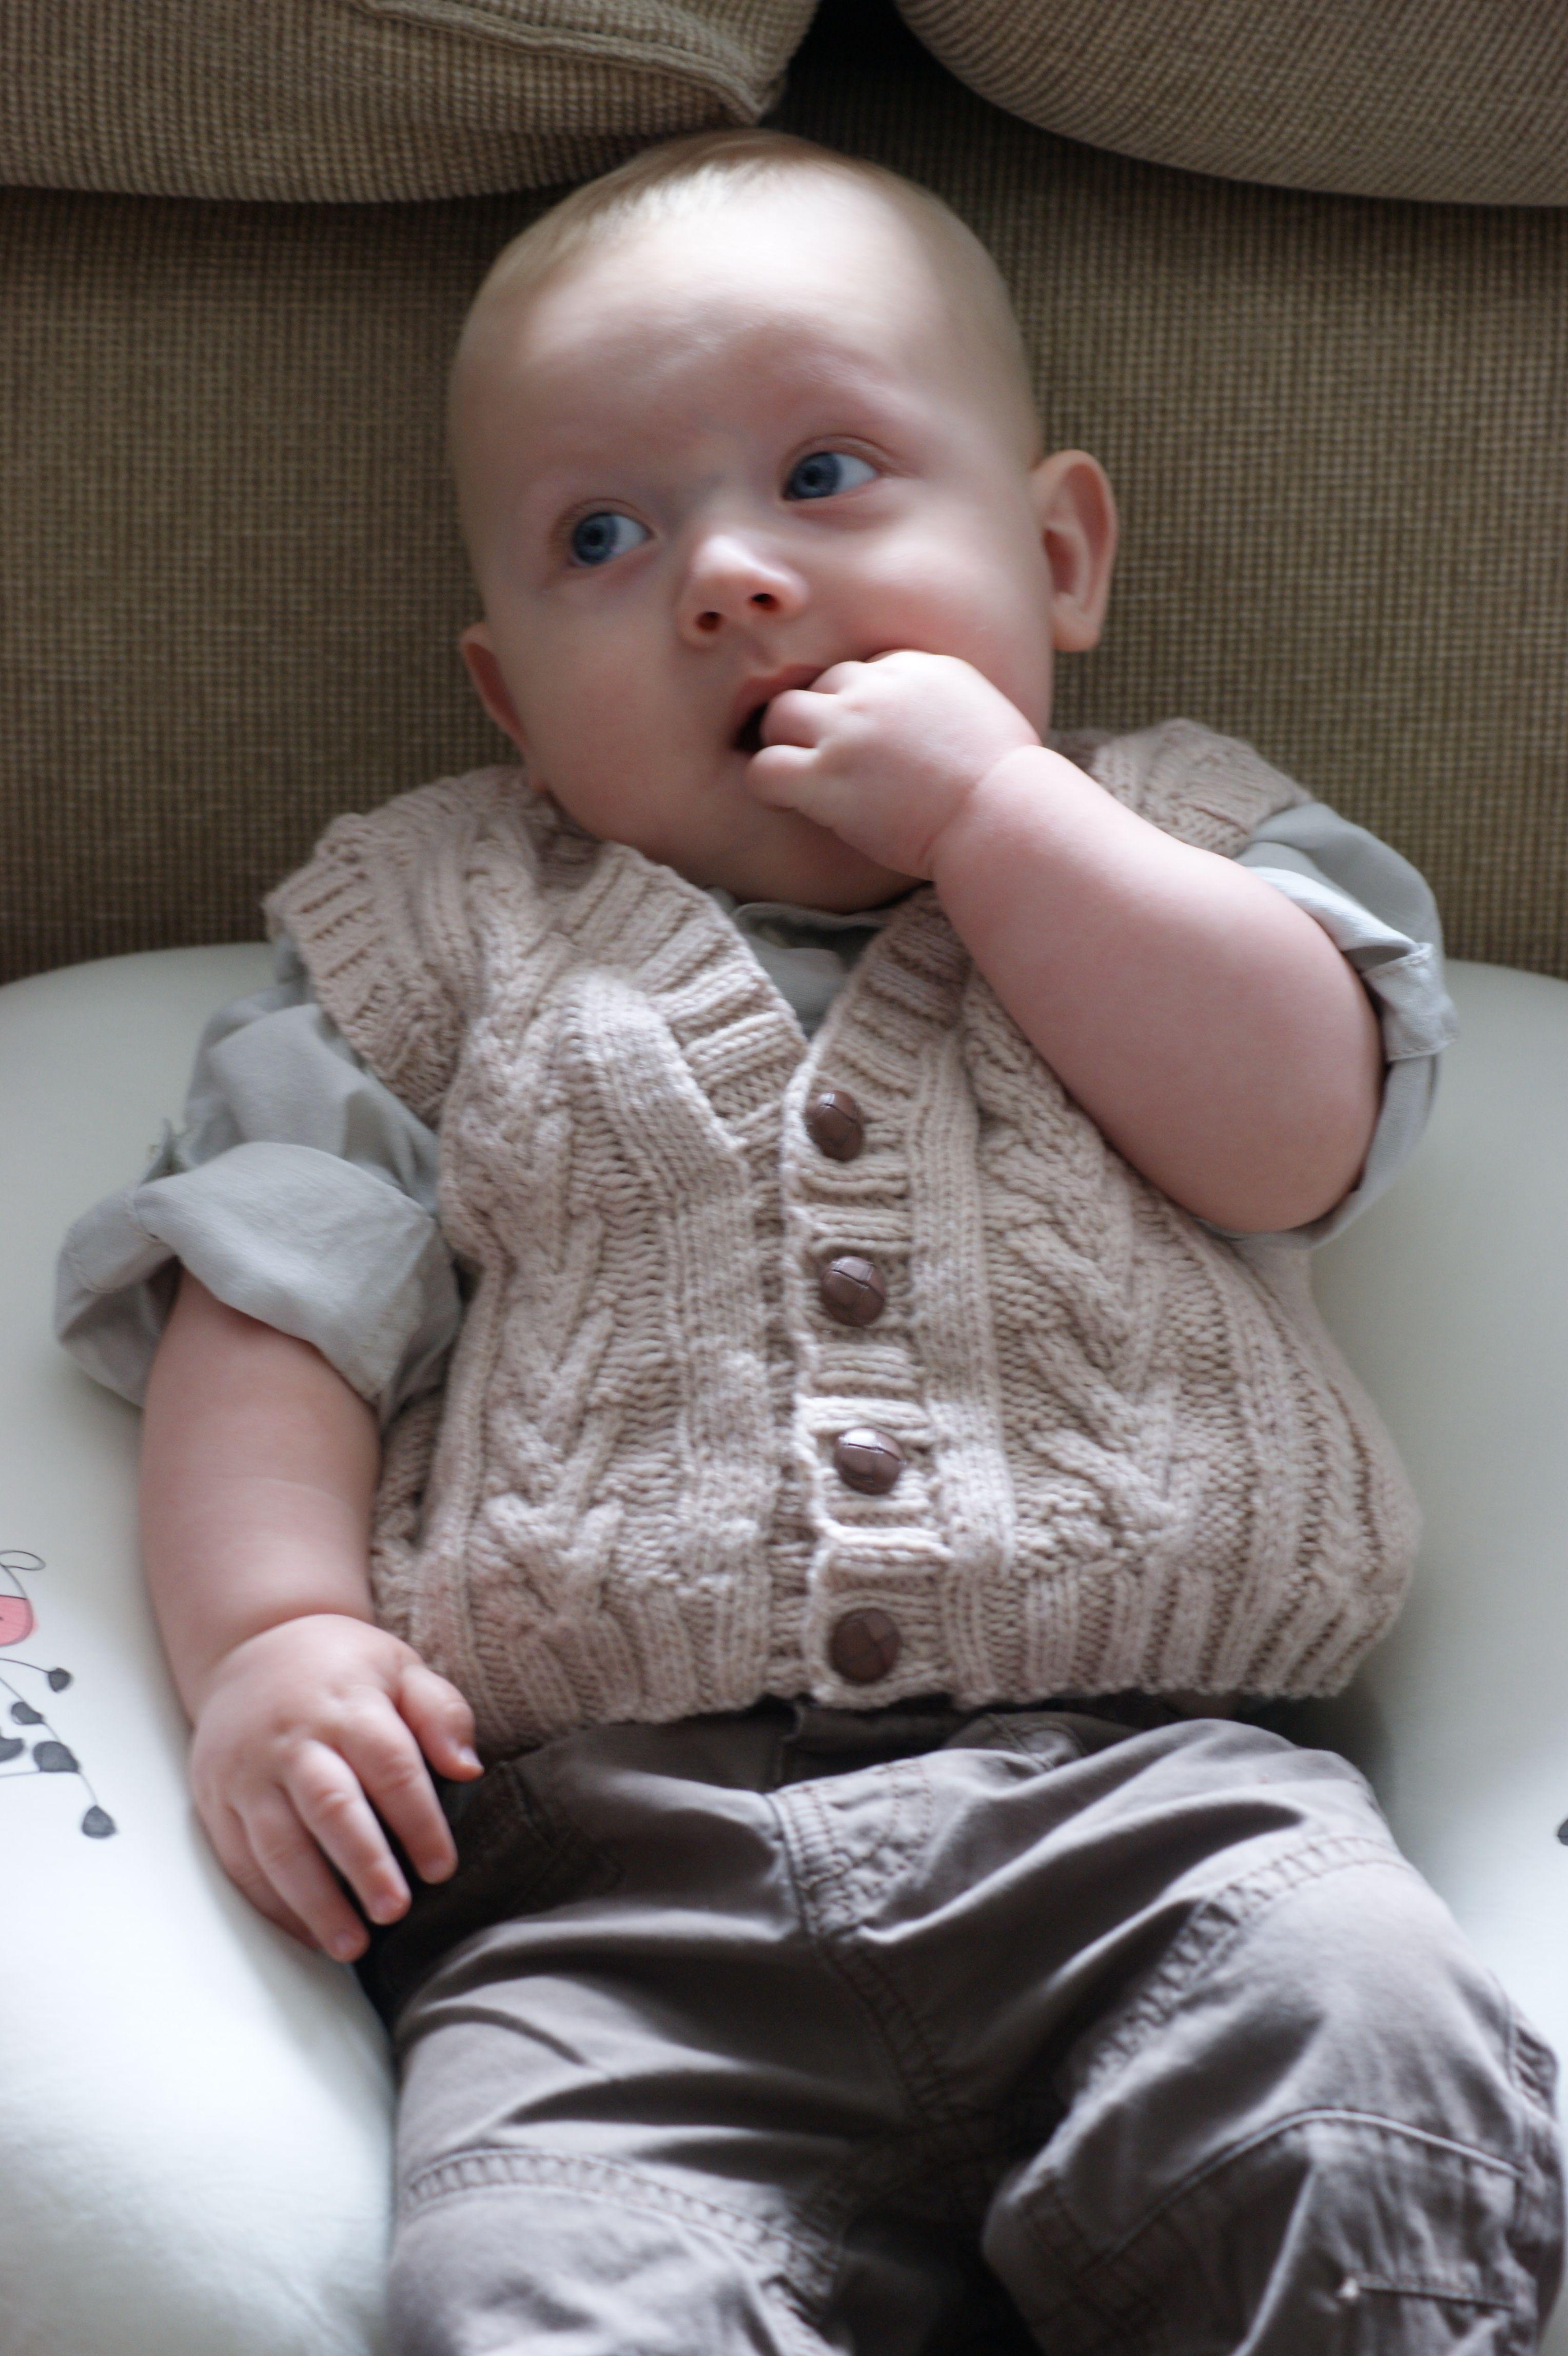 Sirdar pattern - Waistcoat | Baby knitting patterns, Baby ...